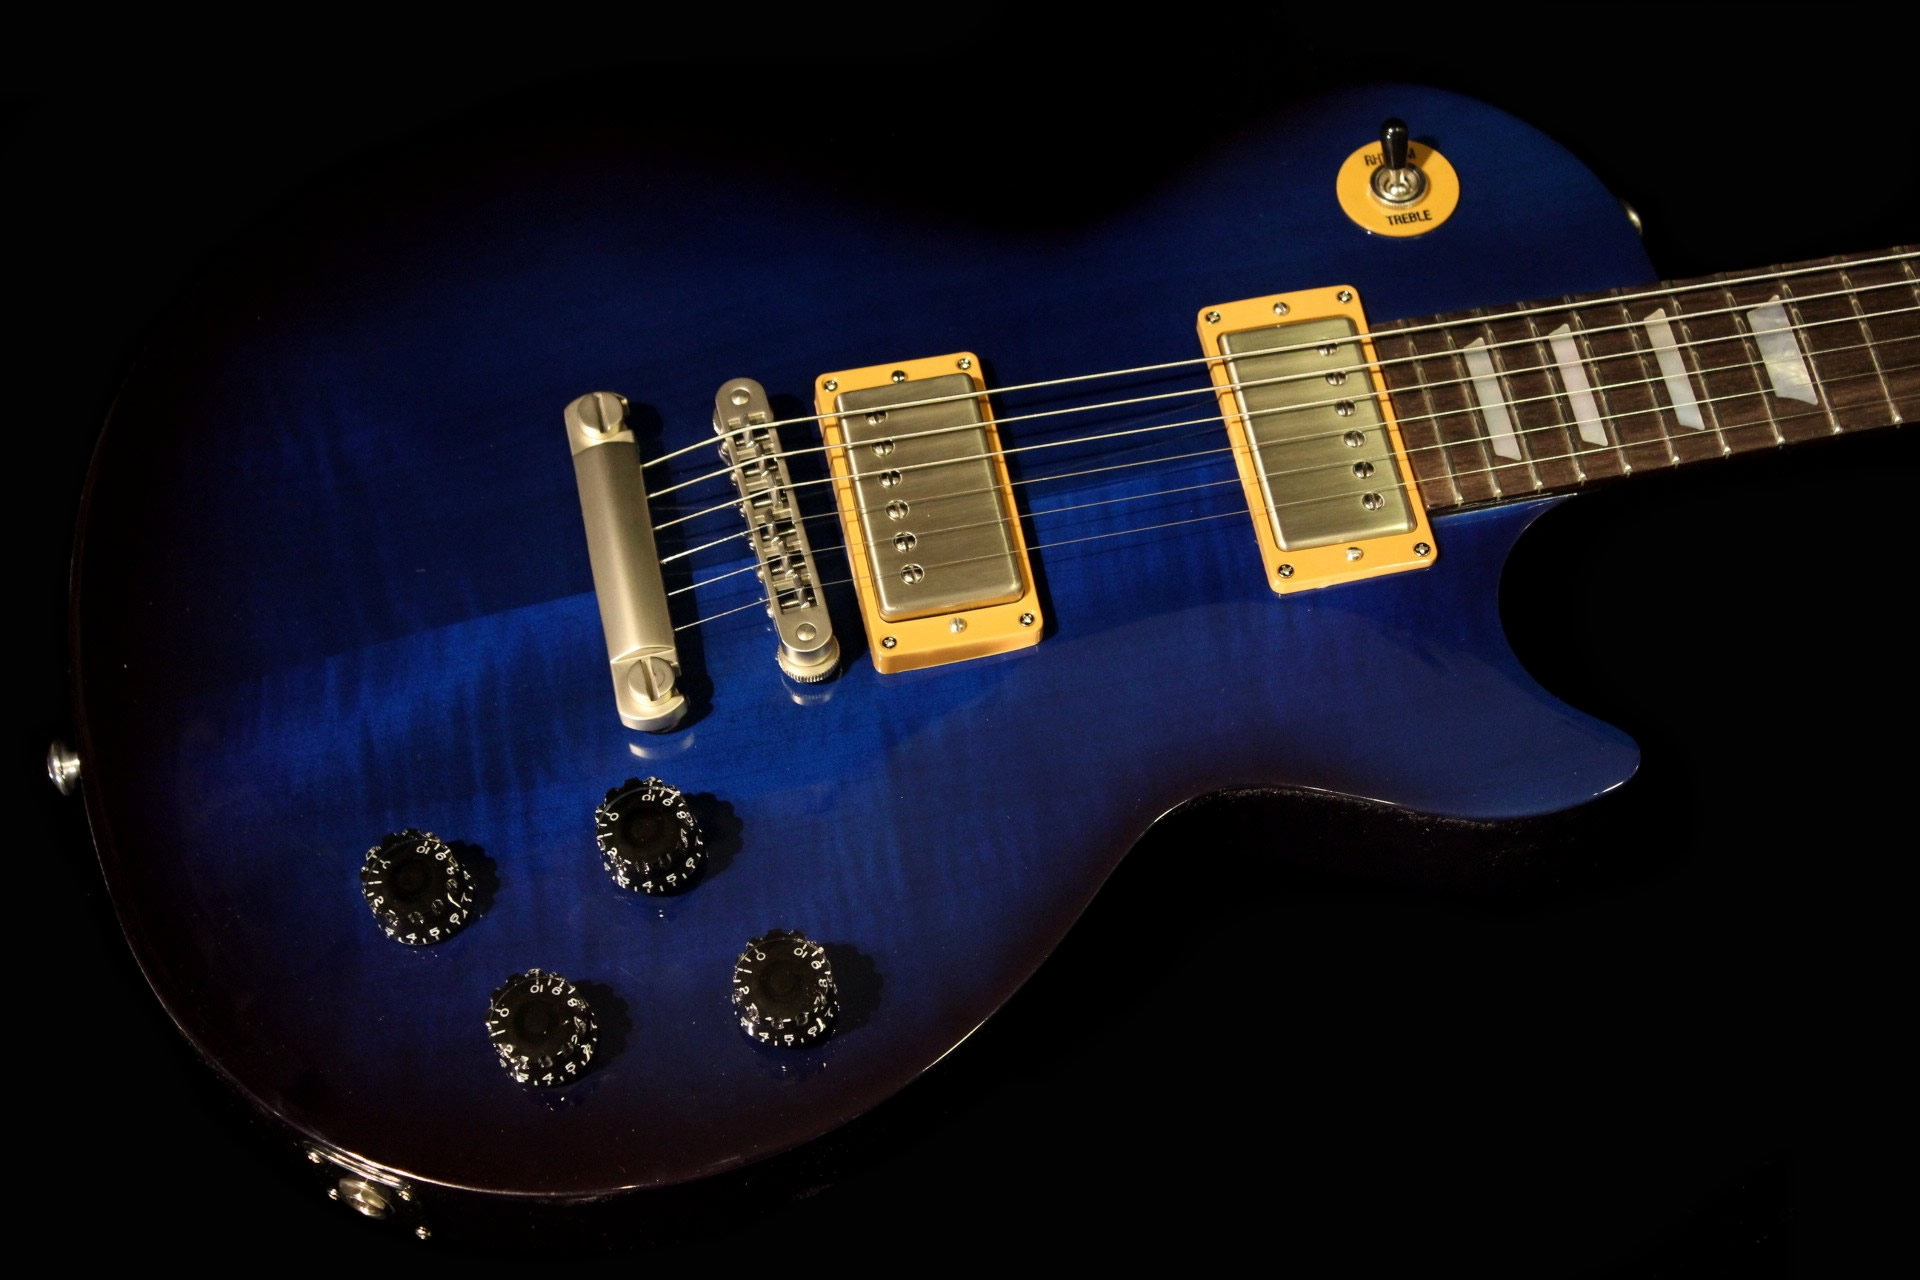 gibson les paul studio 2015 manhattan midnight sn 150010510 gino guitars. Black Bedroom Furniture Sets. Home Design Ideas